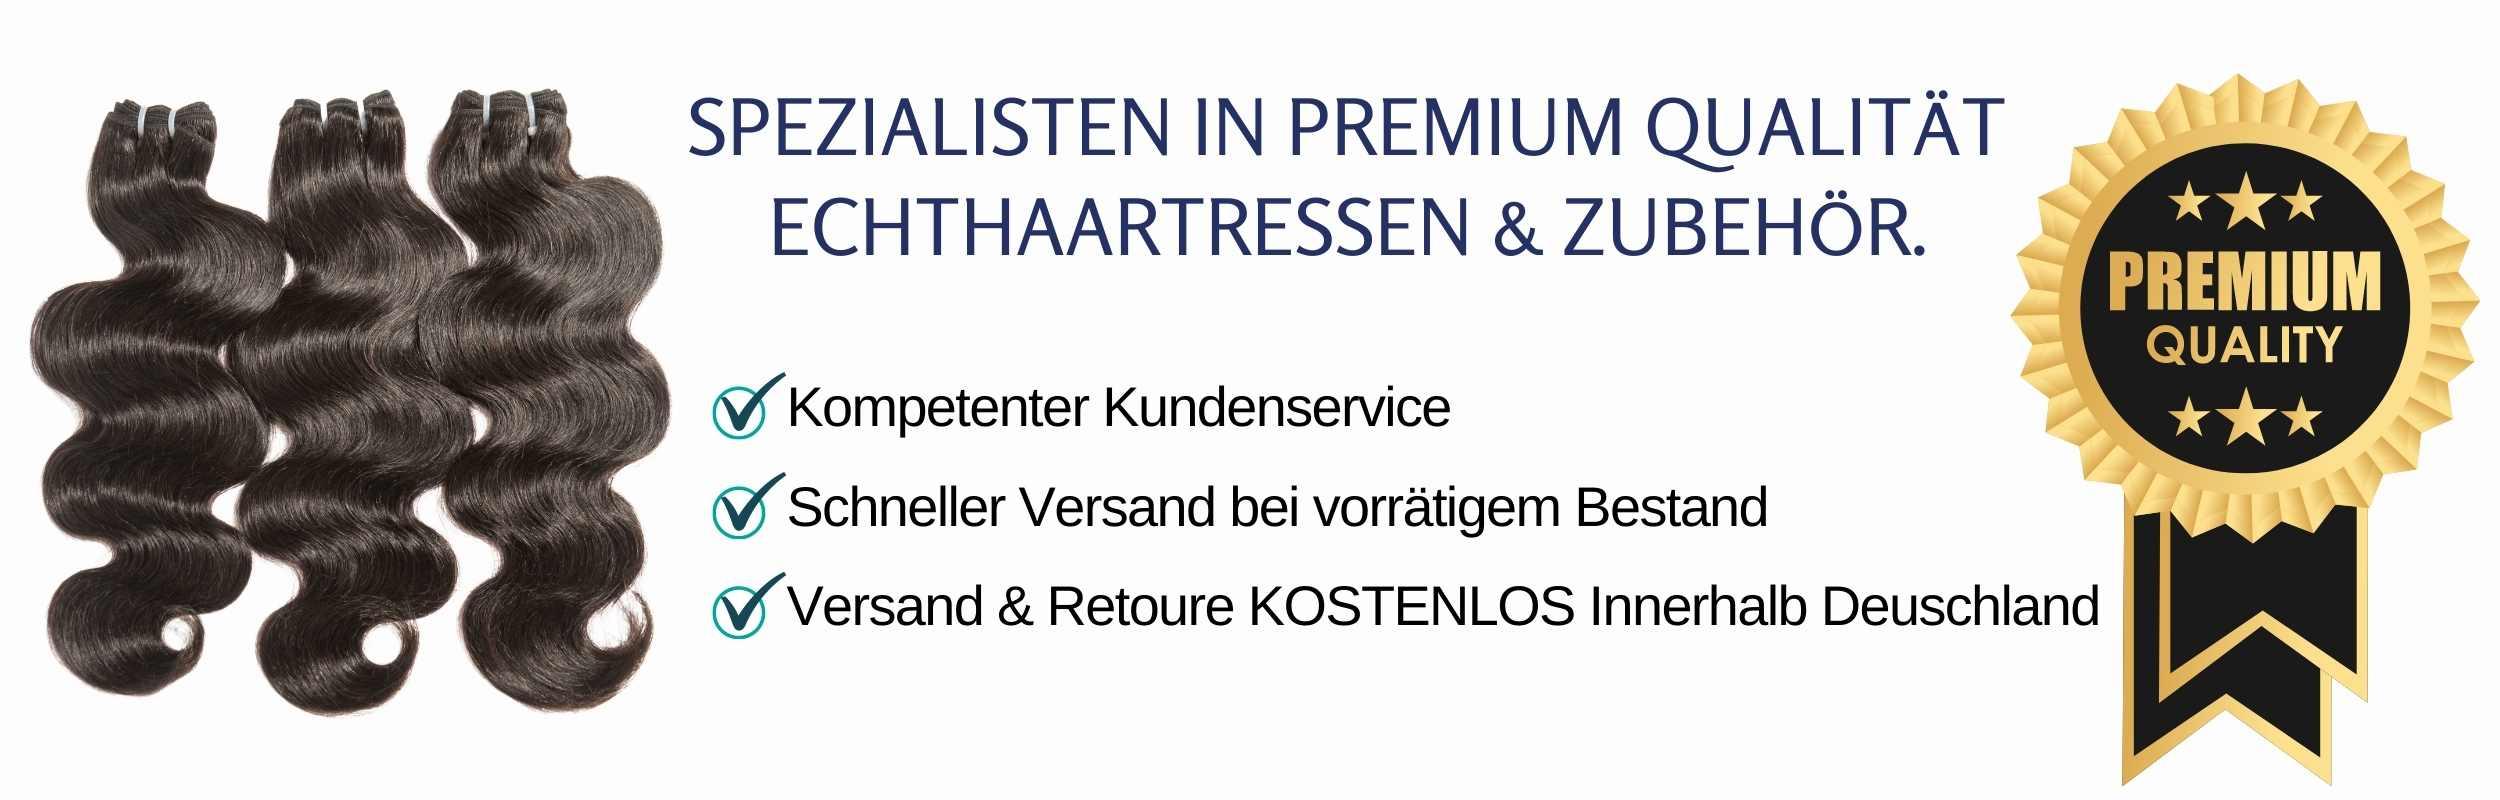 Echthaartressen haar extensions clip in extensions doubledrawn hair brazillian virgin hair toupee clips weaving garn näh methode